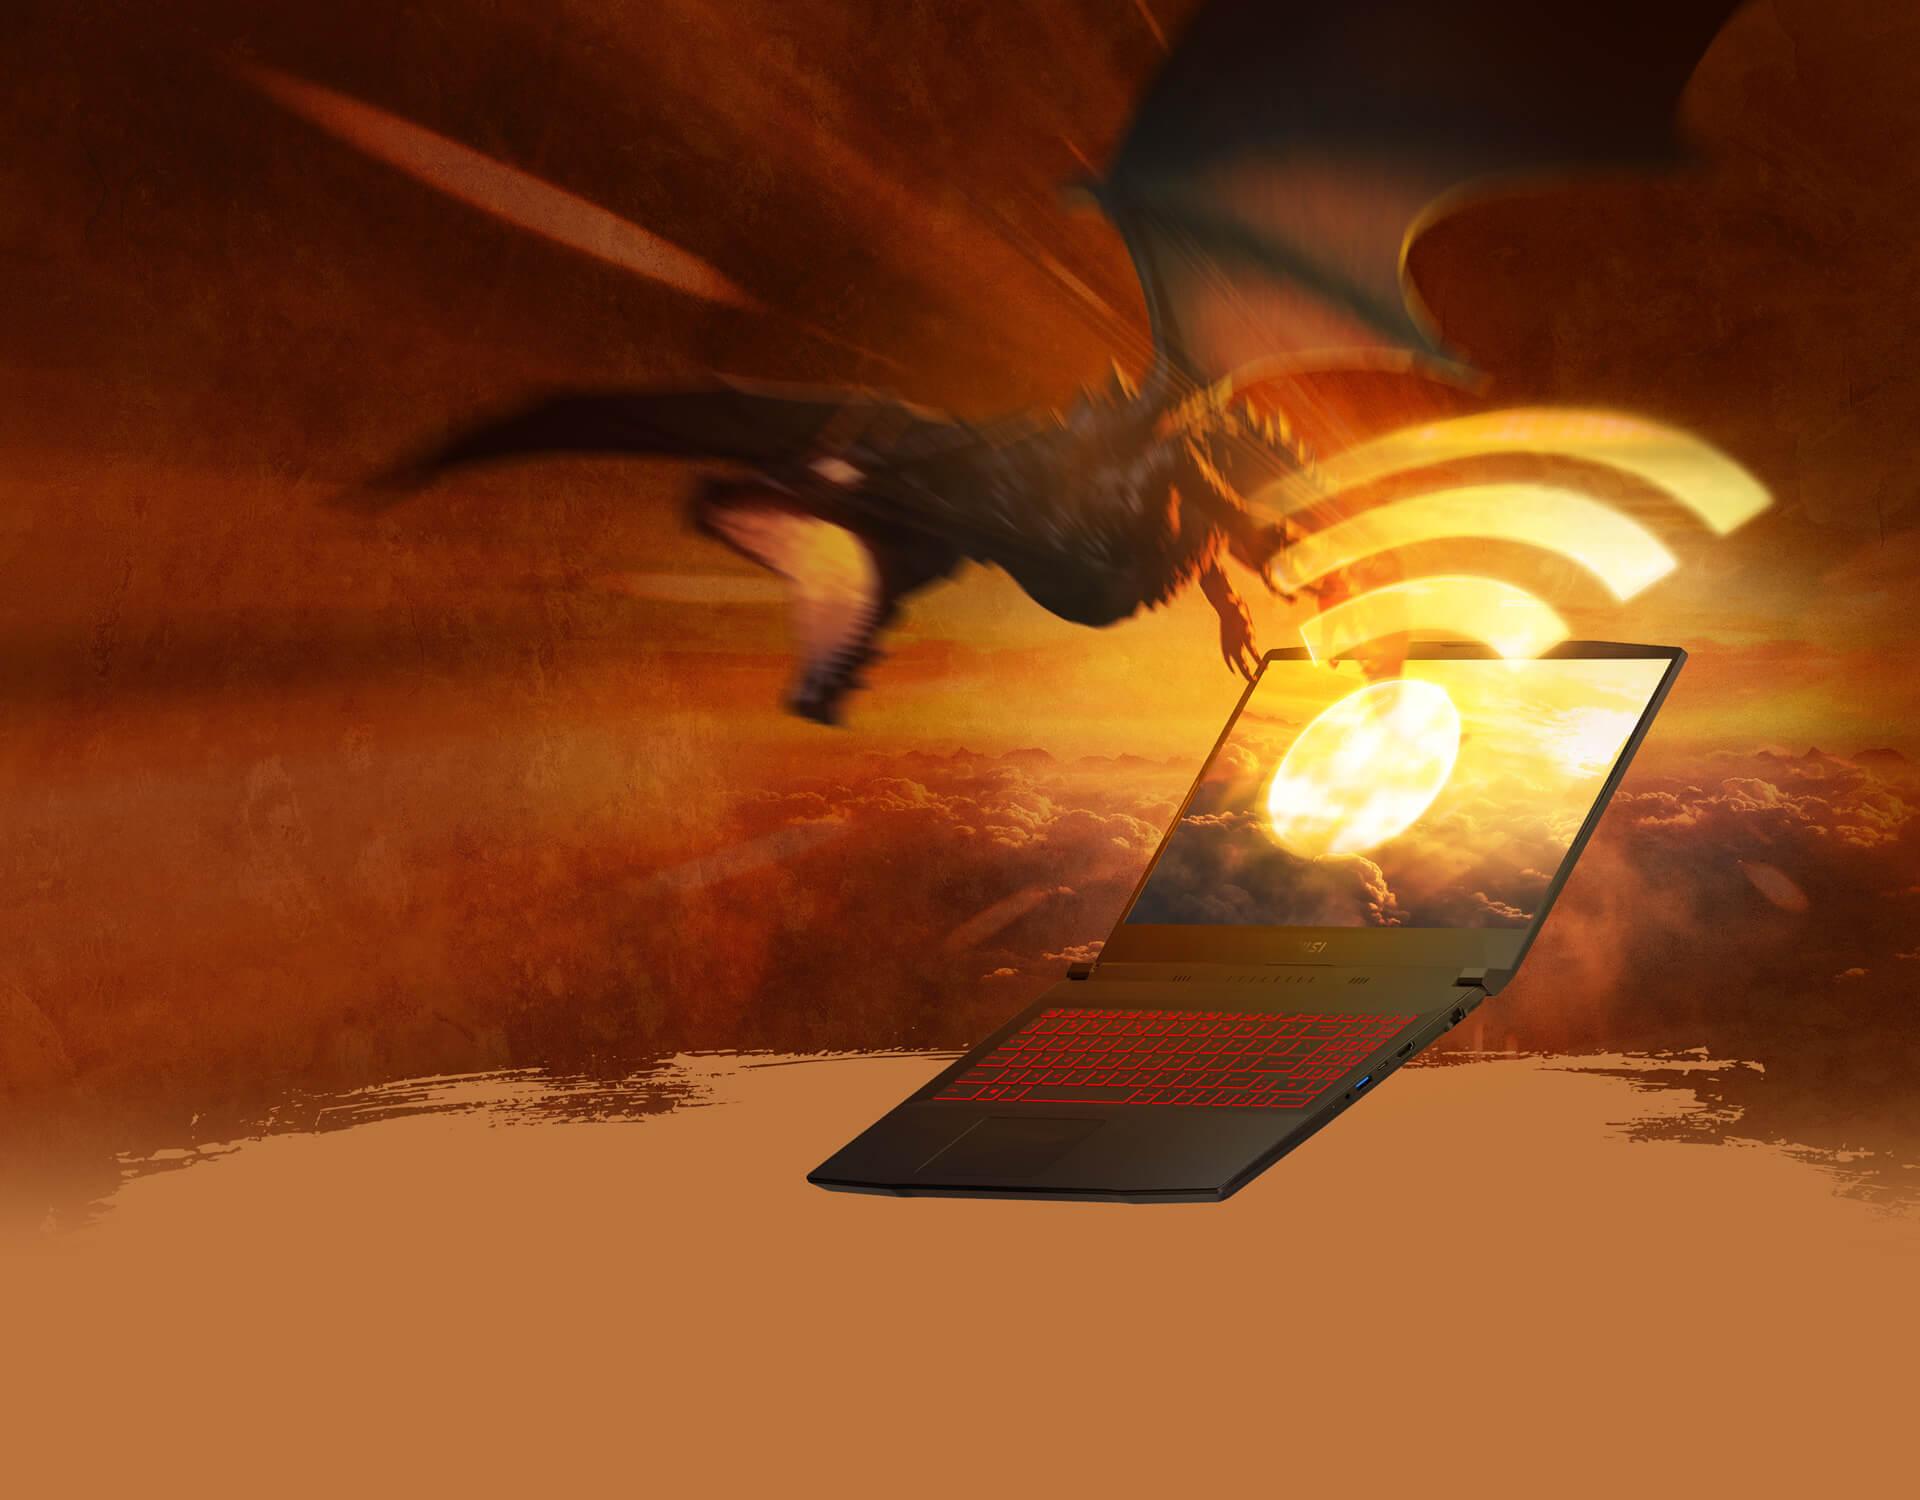 Katana GF66                                                 Intel wi-fi 6 Gig+